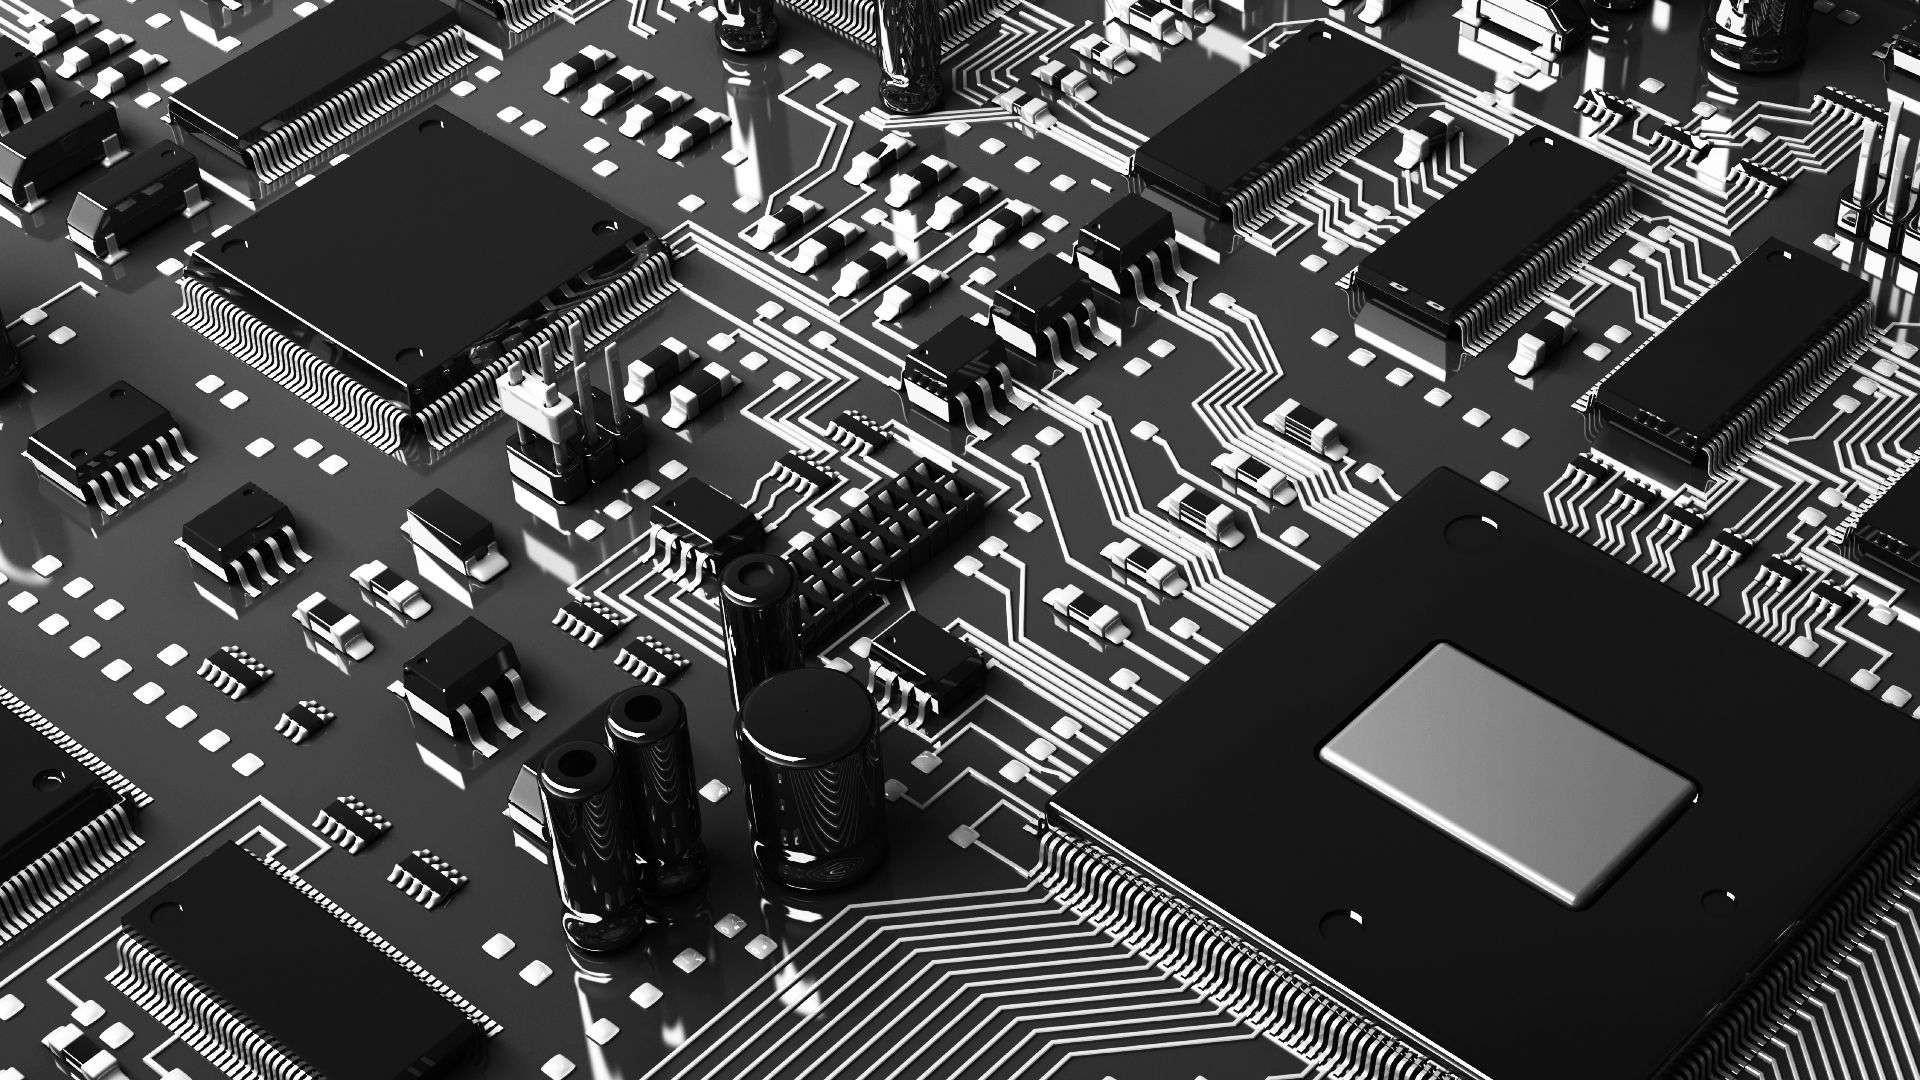 Circuit Board hd desktop wallpaper